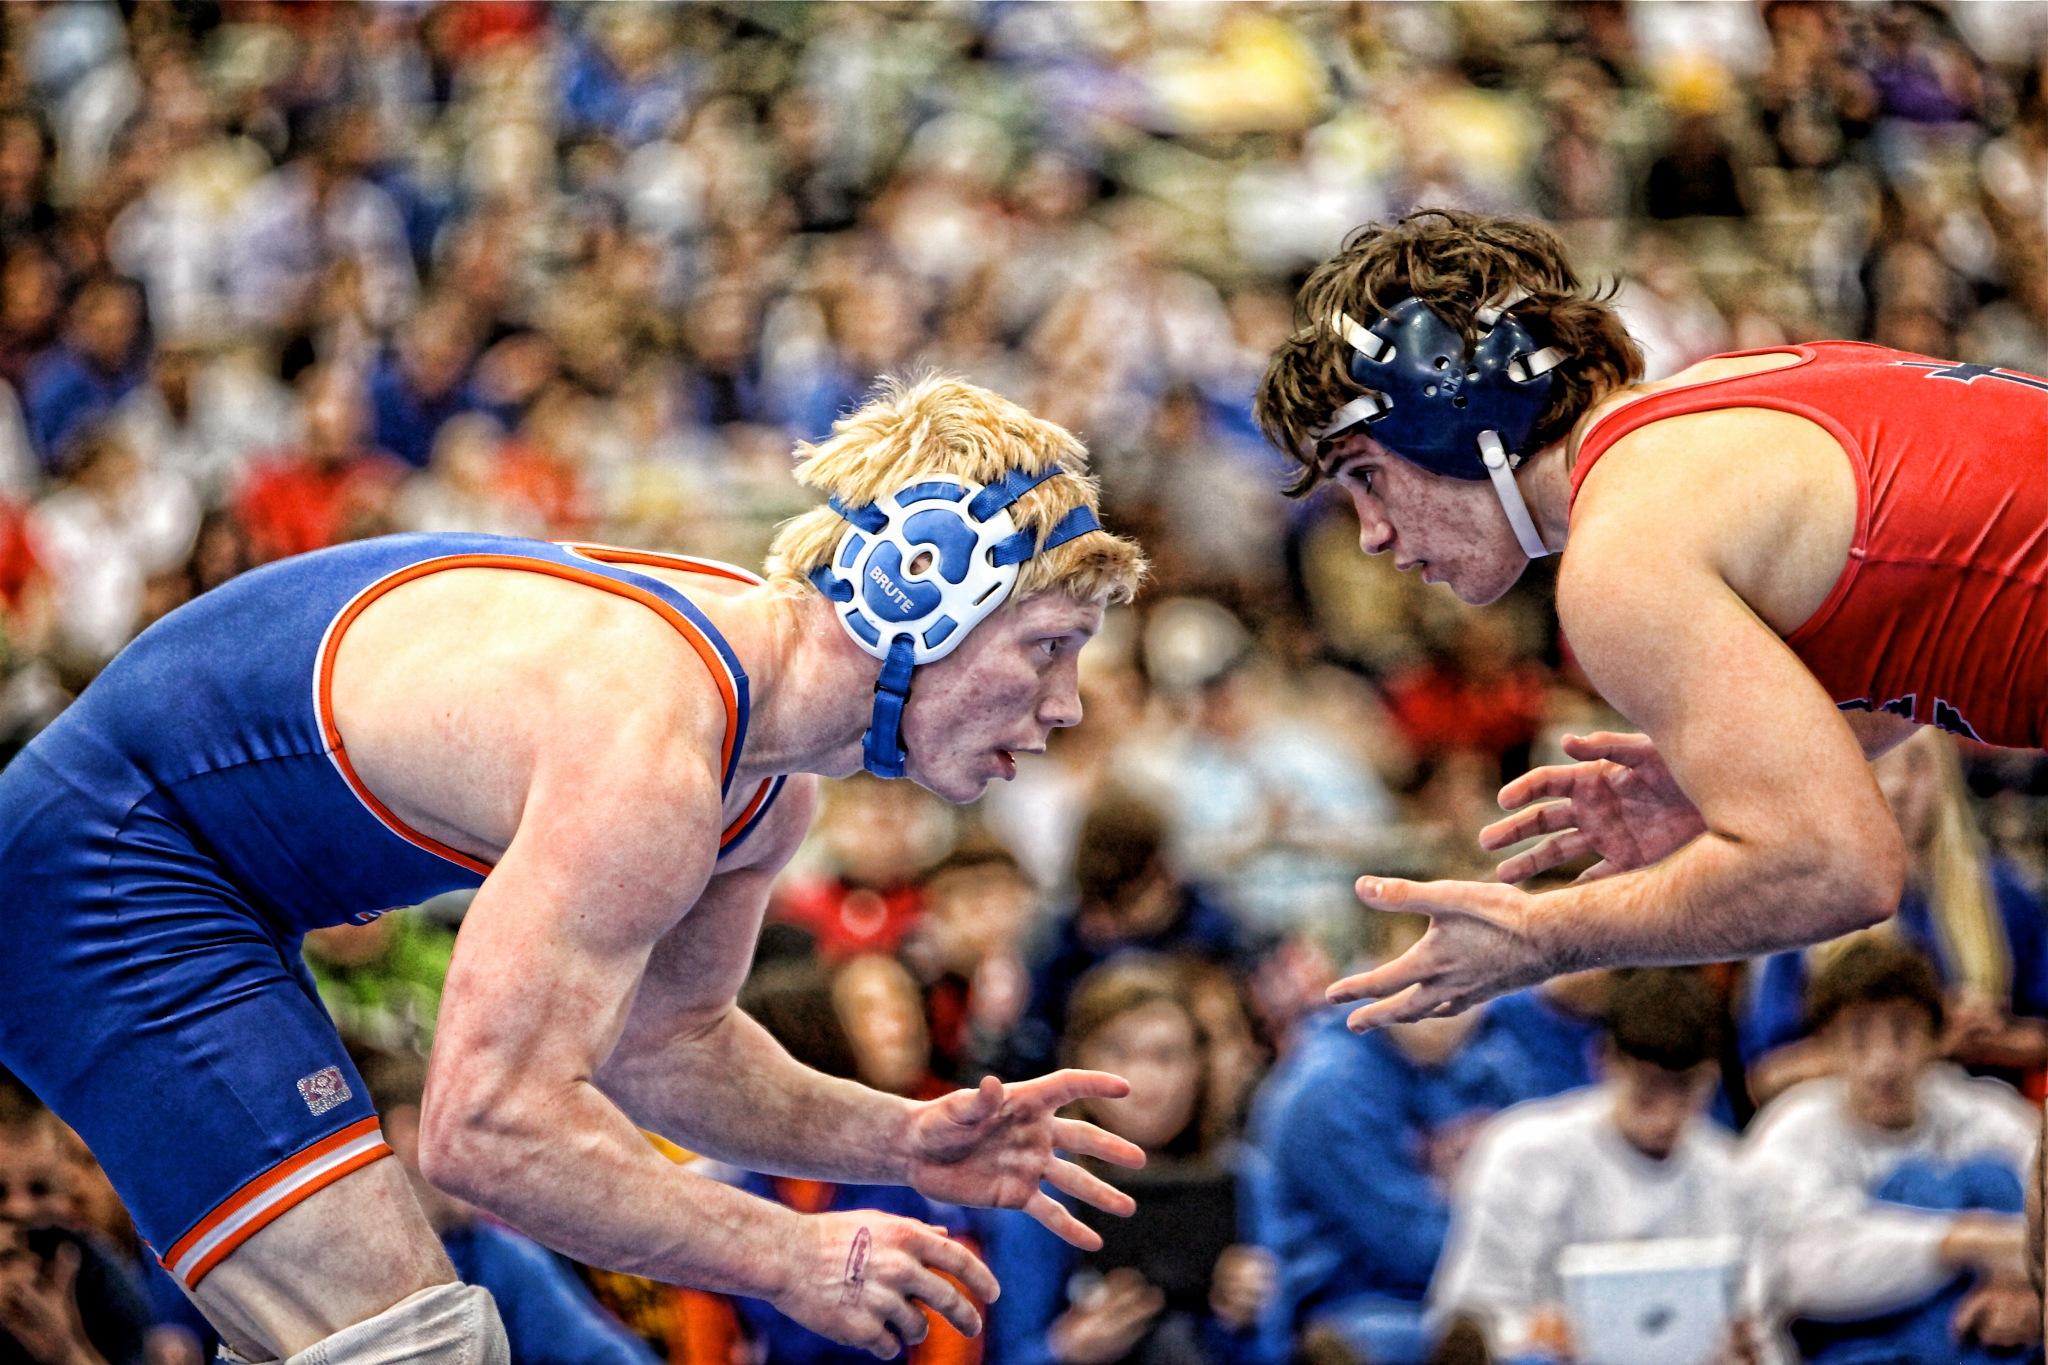 Championship Match by Steve Schindler